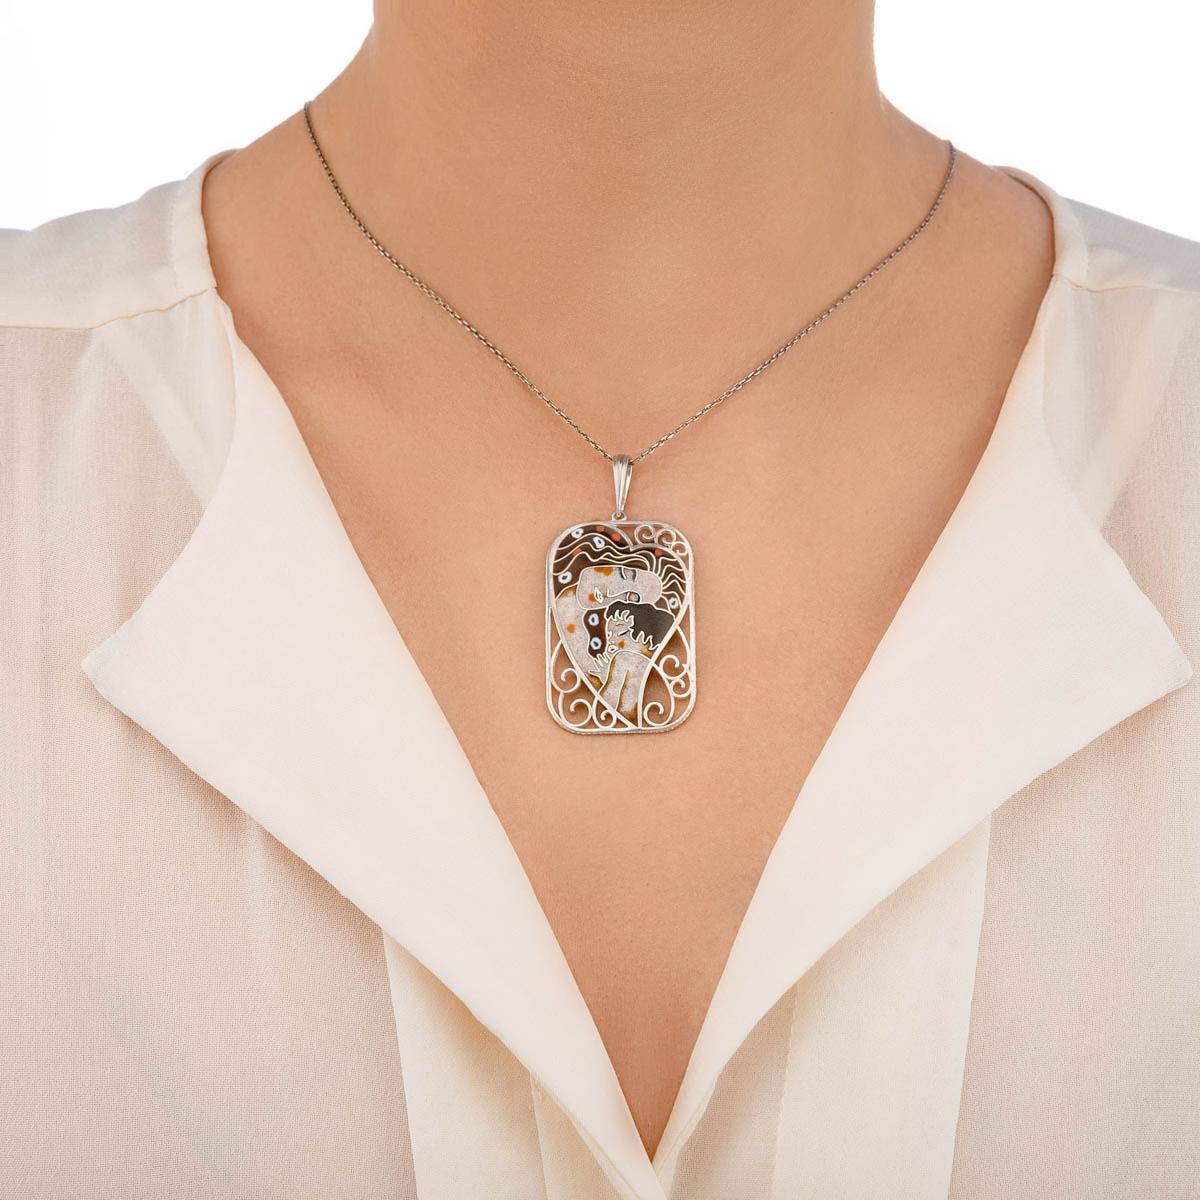 podveska materinstvo - Подвеска из серебра «Материнство»